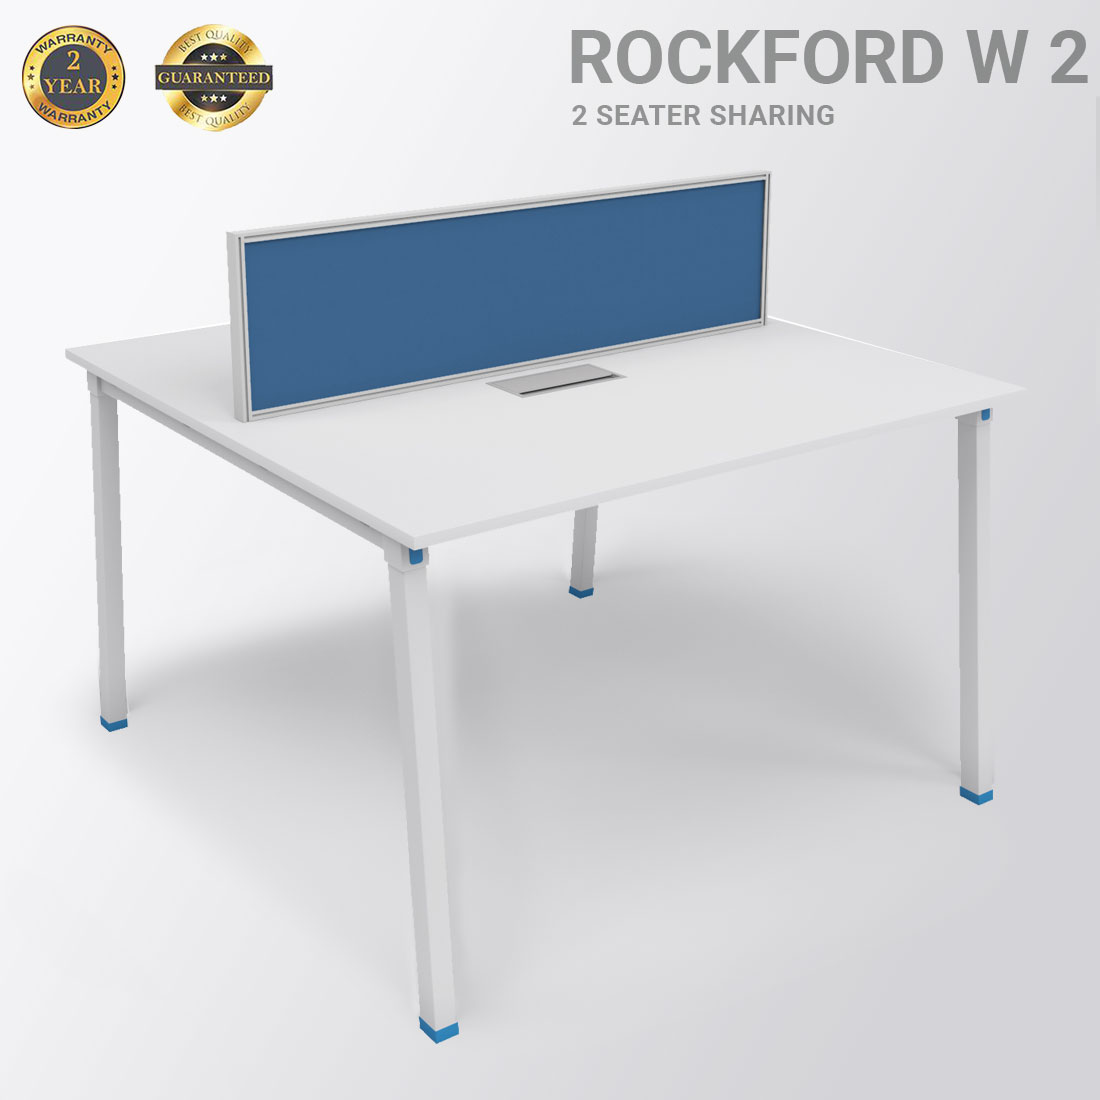 Rockford W 2 Seater   Sharing